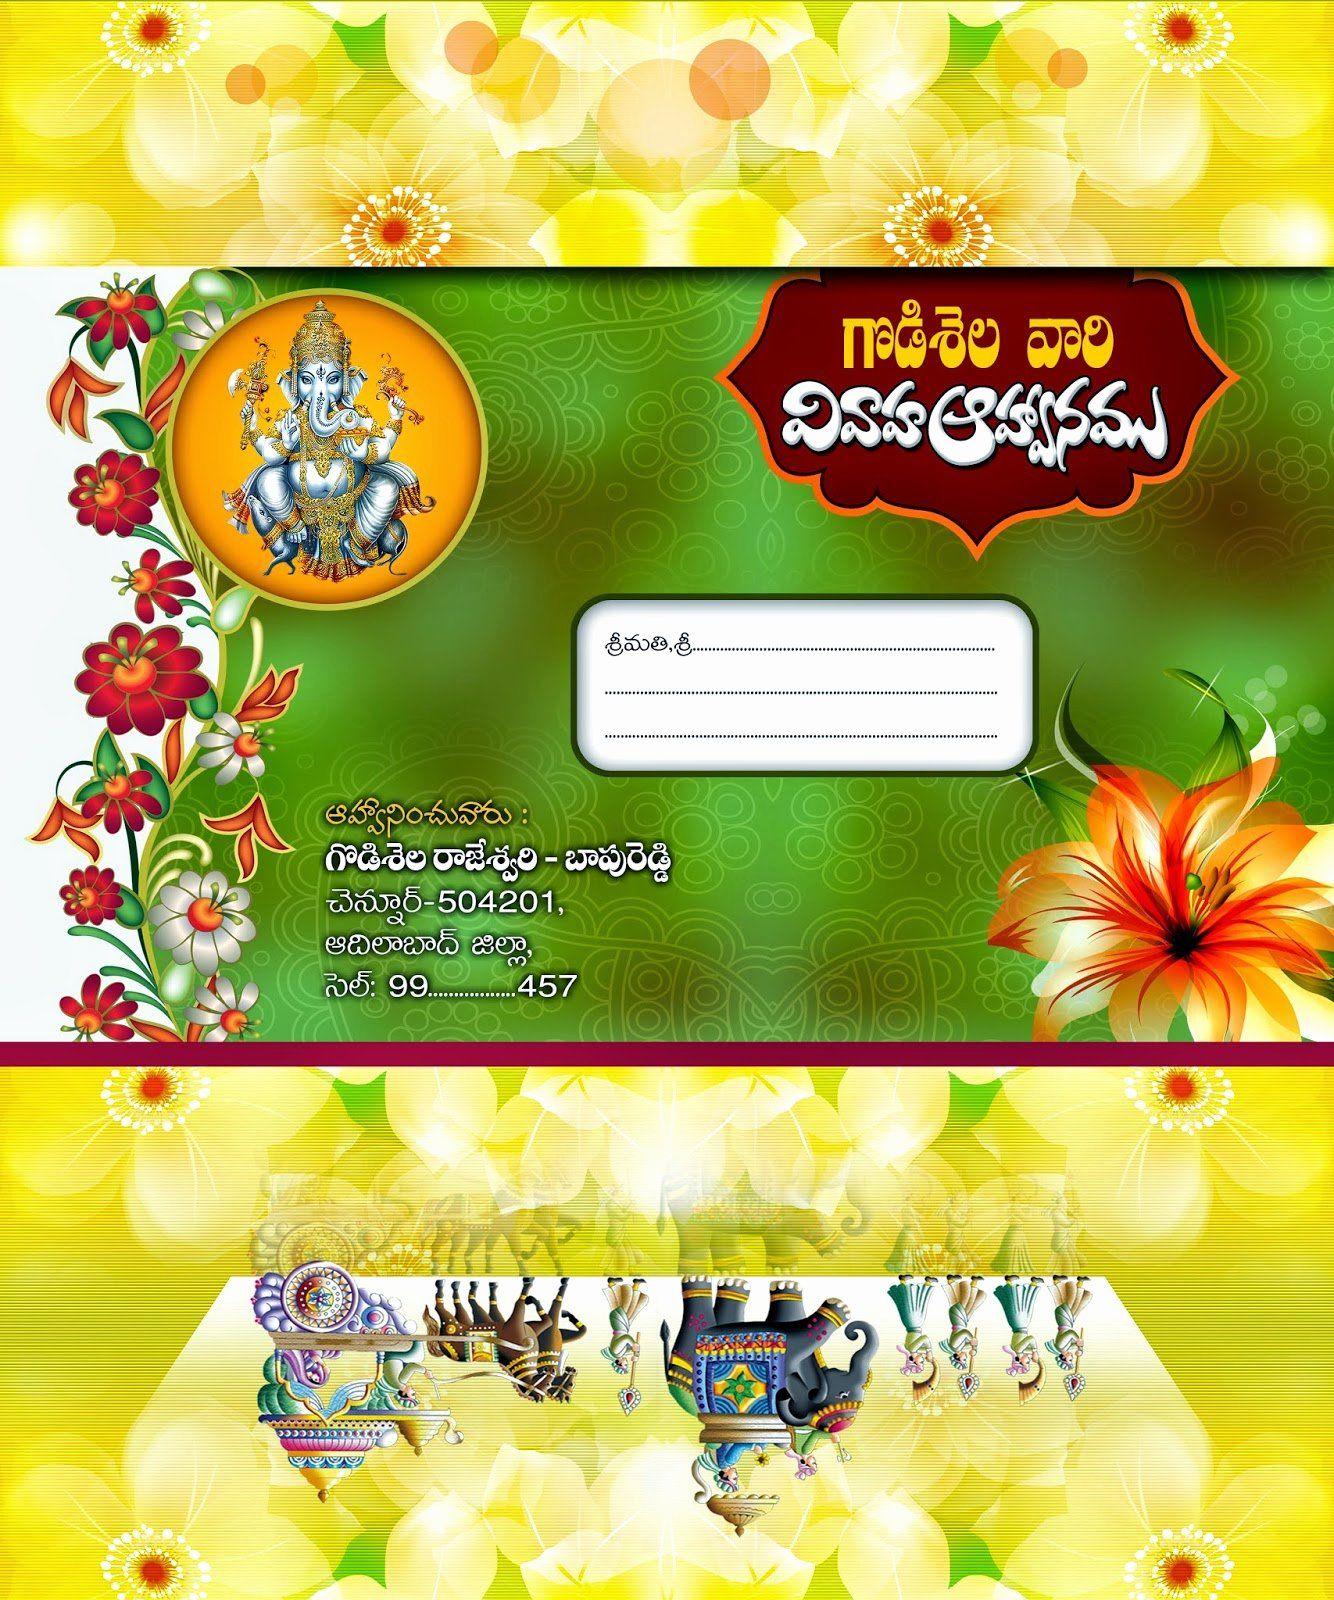 Wedding Invitation Template Psd Elegant Wedding Invitation Ca Wedding Invitation Cards Handmade Wedding Invitation Card Design Wedding Invitation Card Template